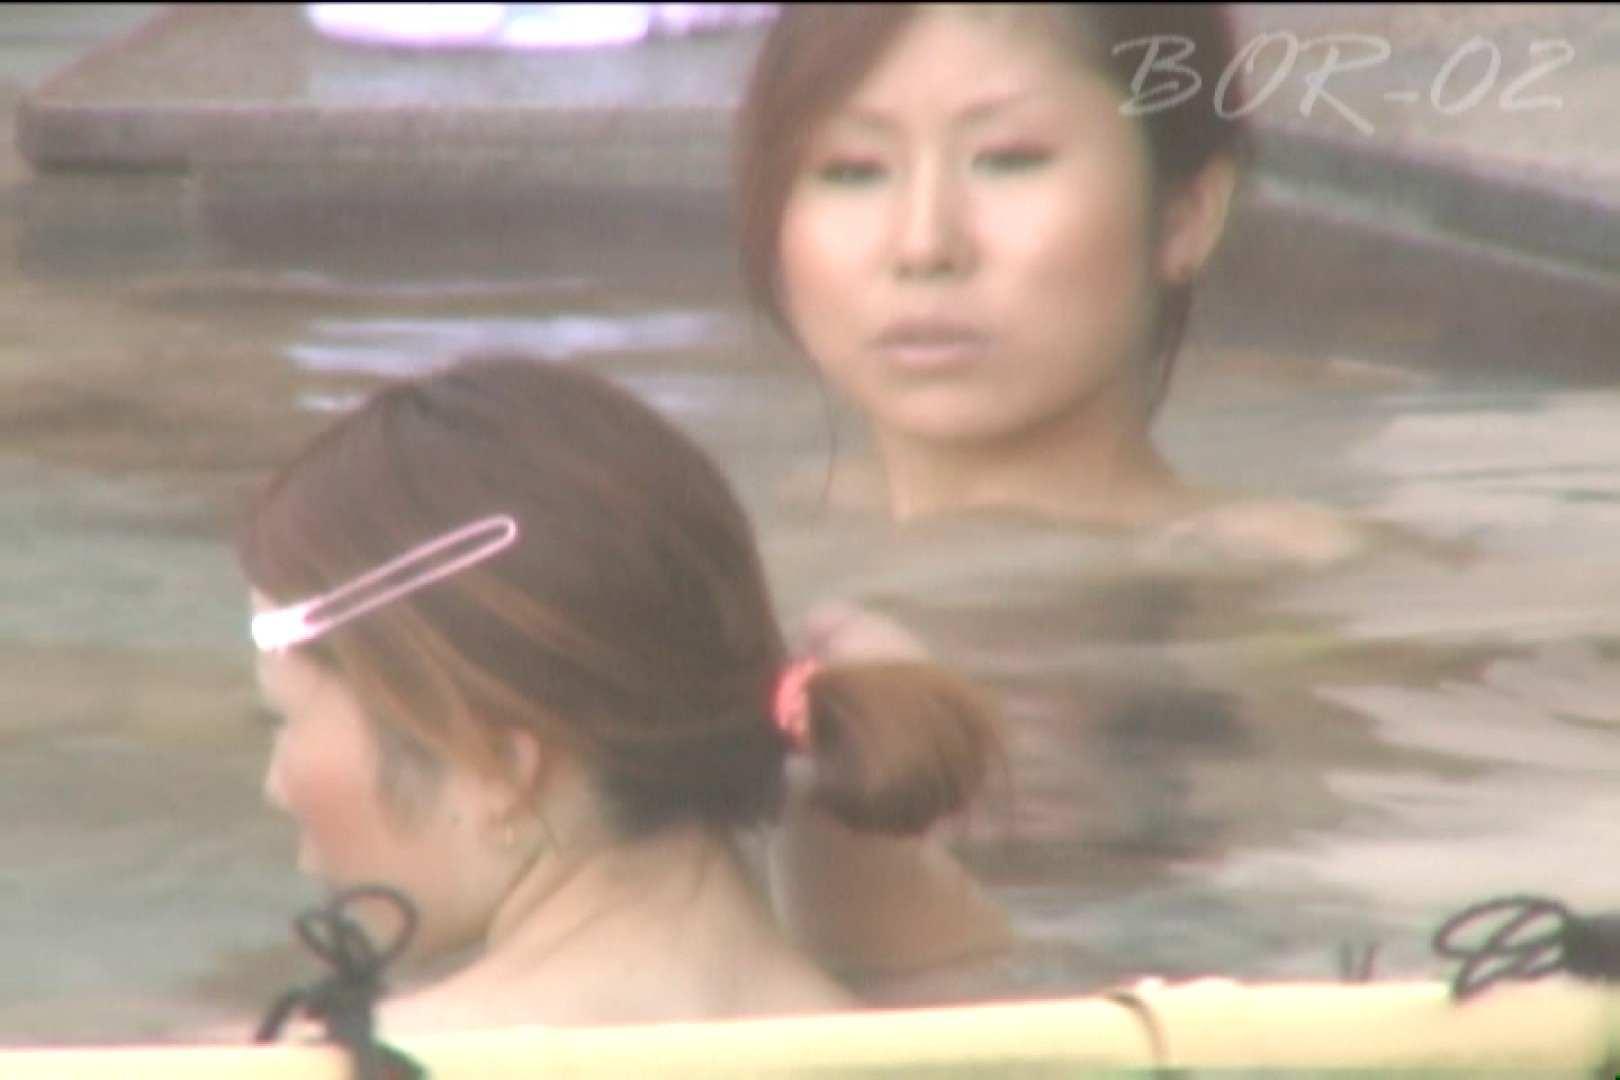 Aquaな露天風呂Vol.477 露天 アダルト動画キャプチャ 99PICs 20